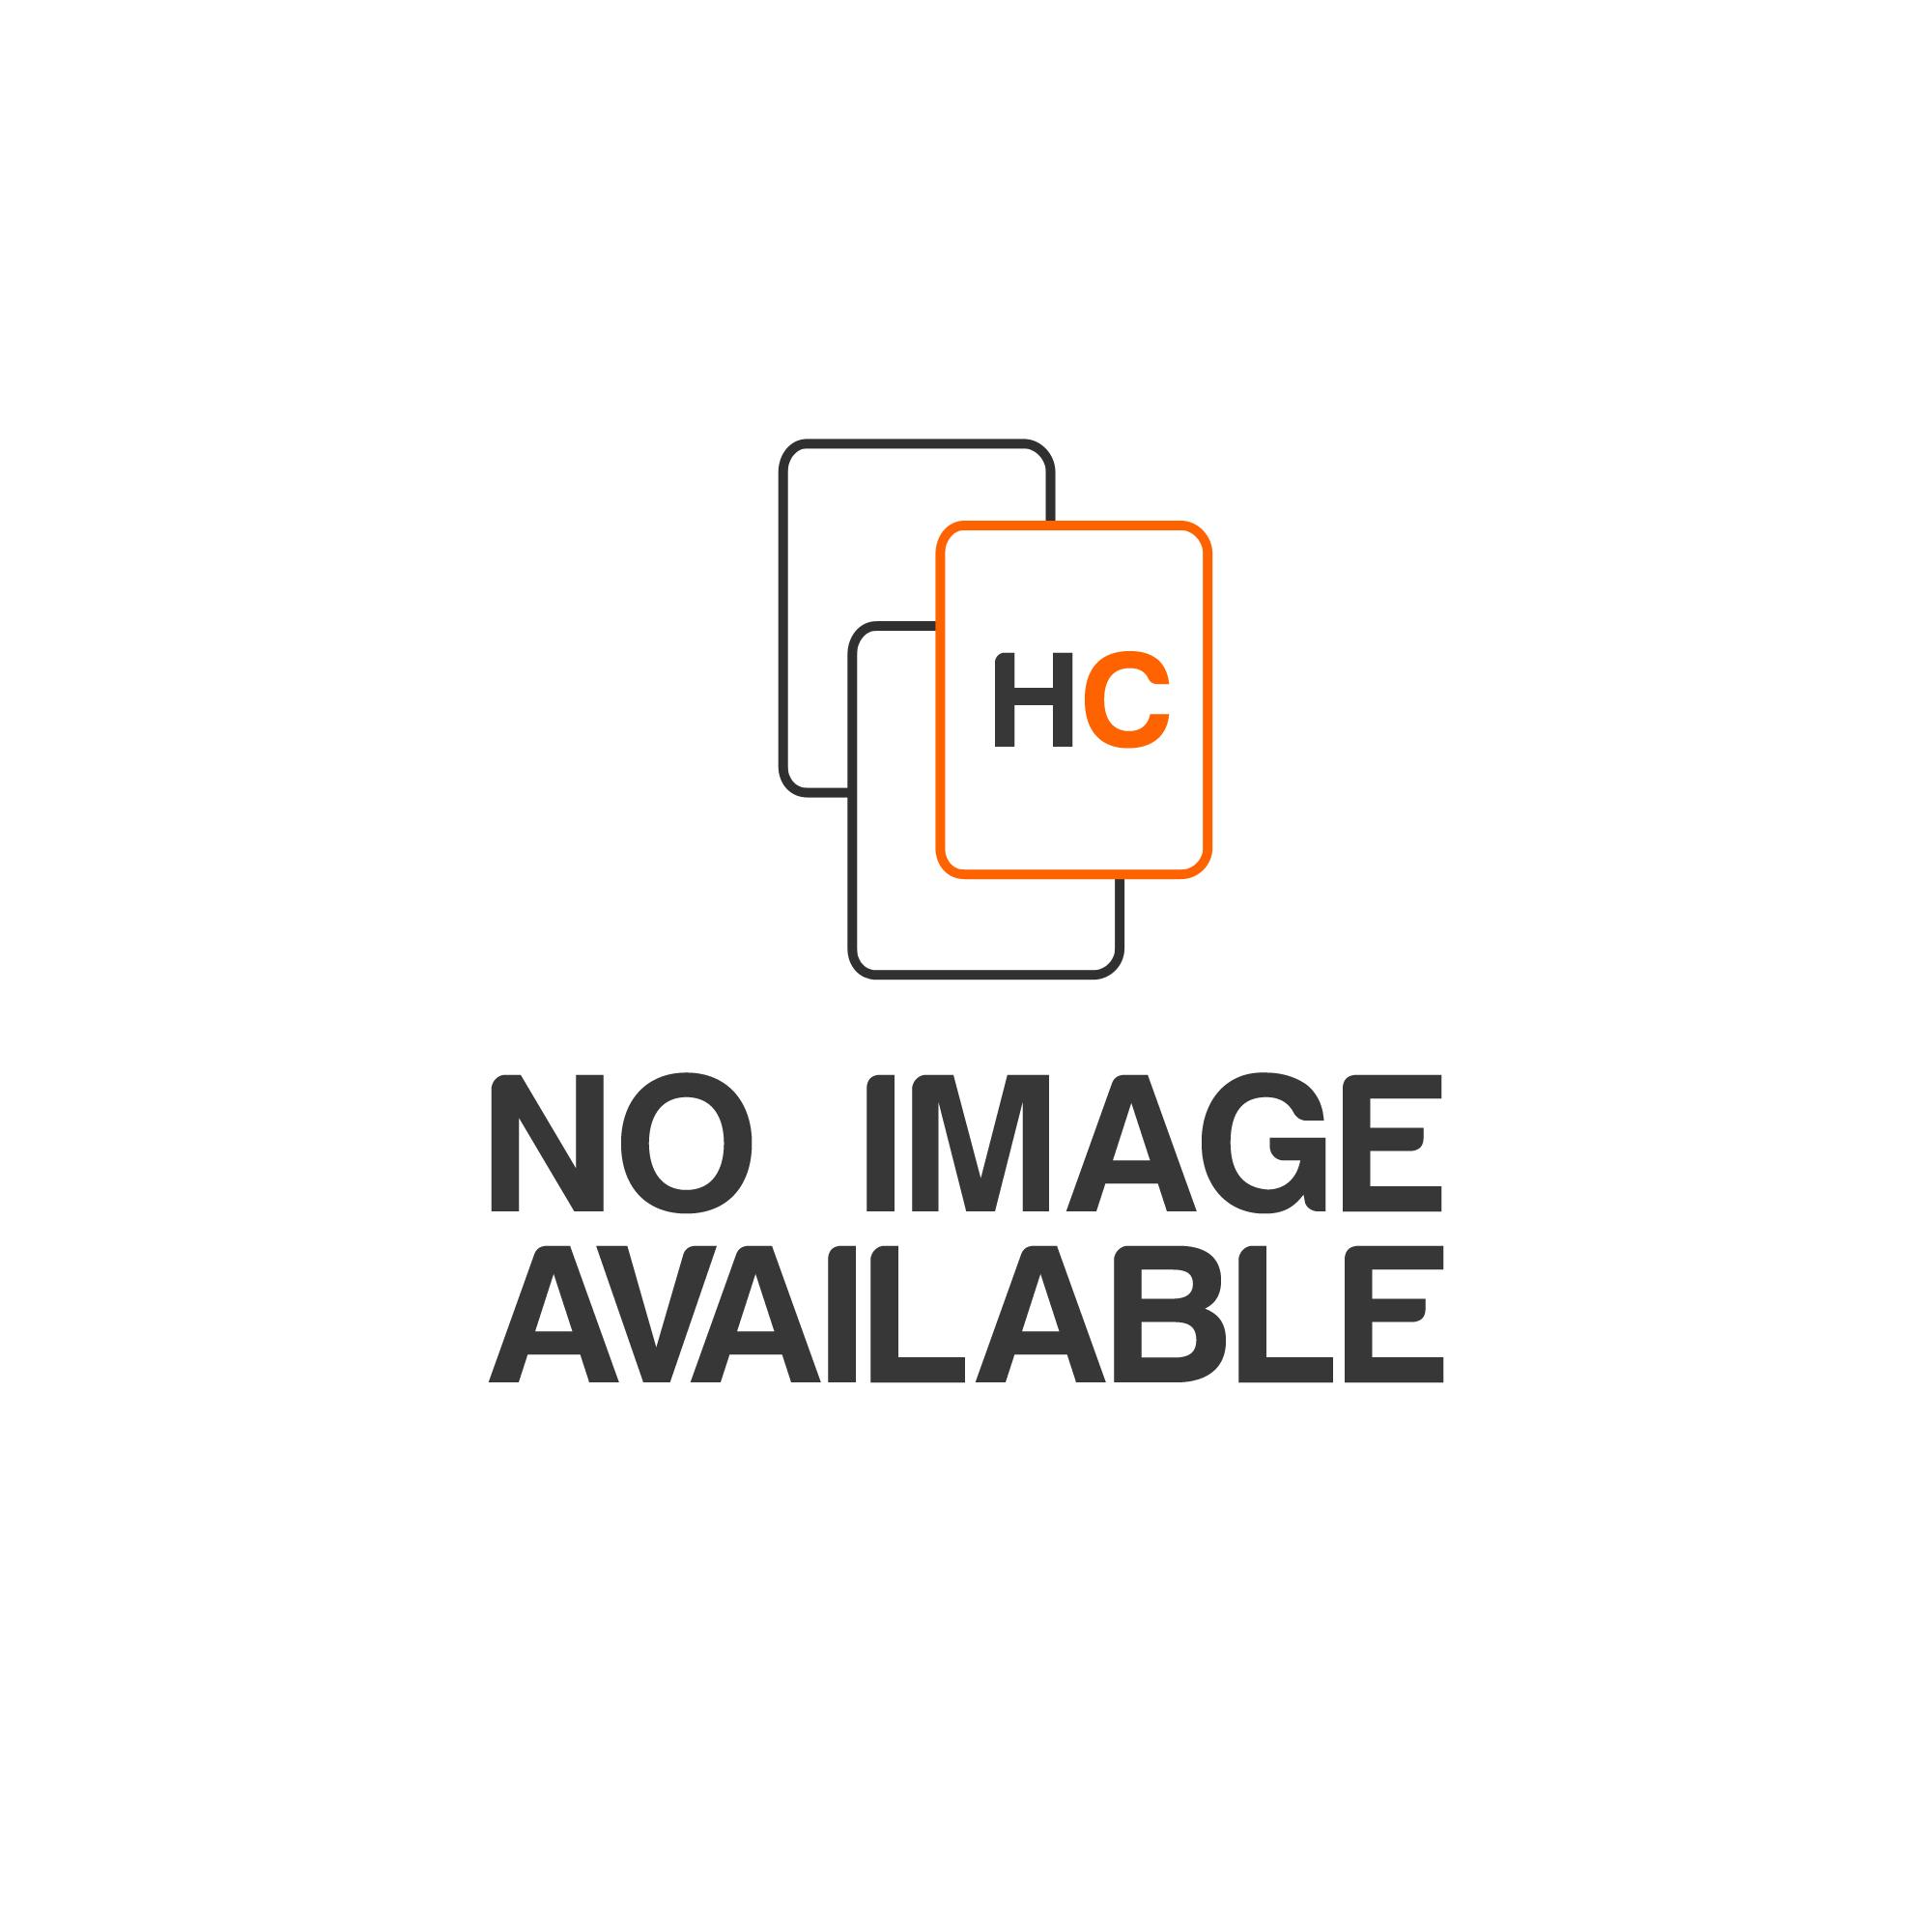 Jazwares The Flintstones Hanna Barbera PVC Action Figure Model Full Set Hot Gift